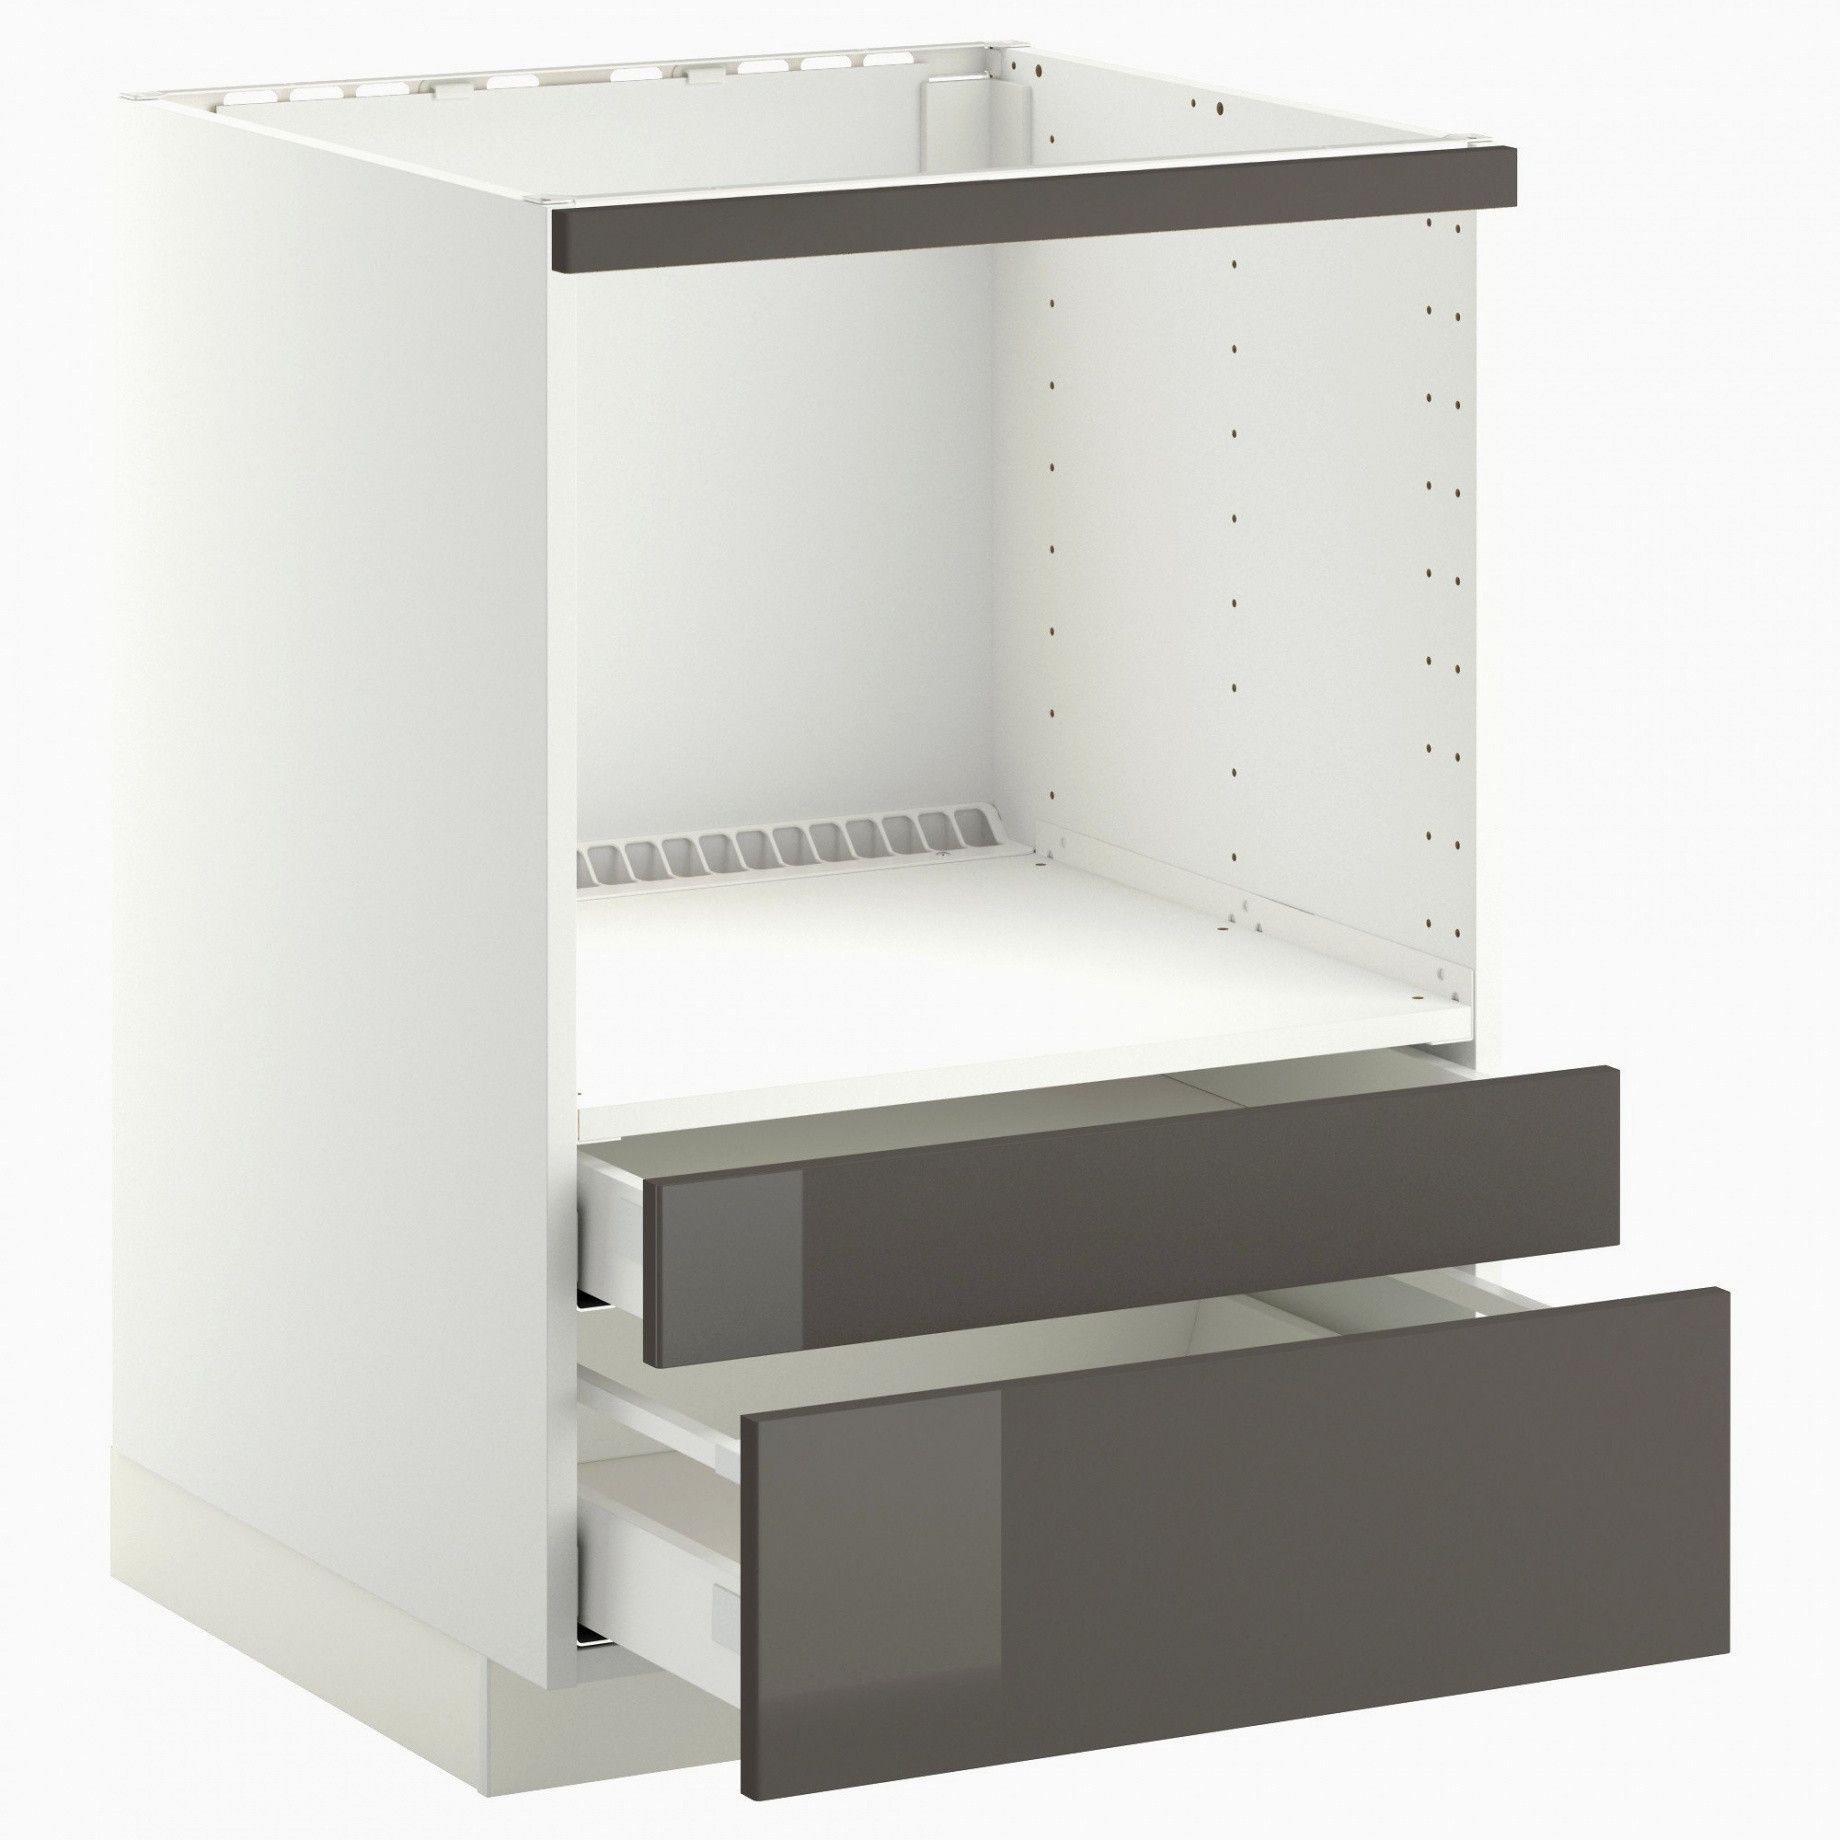 Inspirational Meuble De Cuisine Profondeur 40 Cm Cool Furniture Reupholster Furniture Transforming Furniture